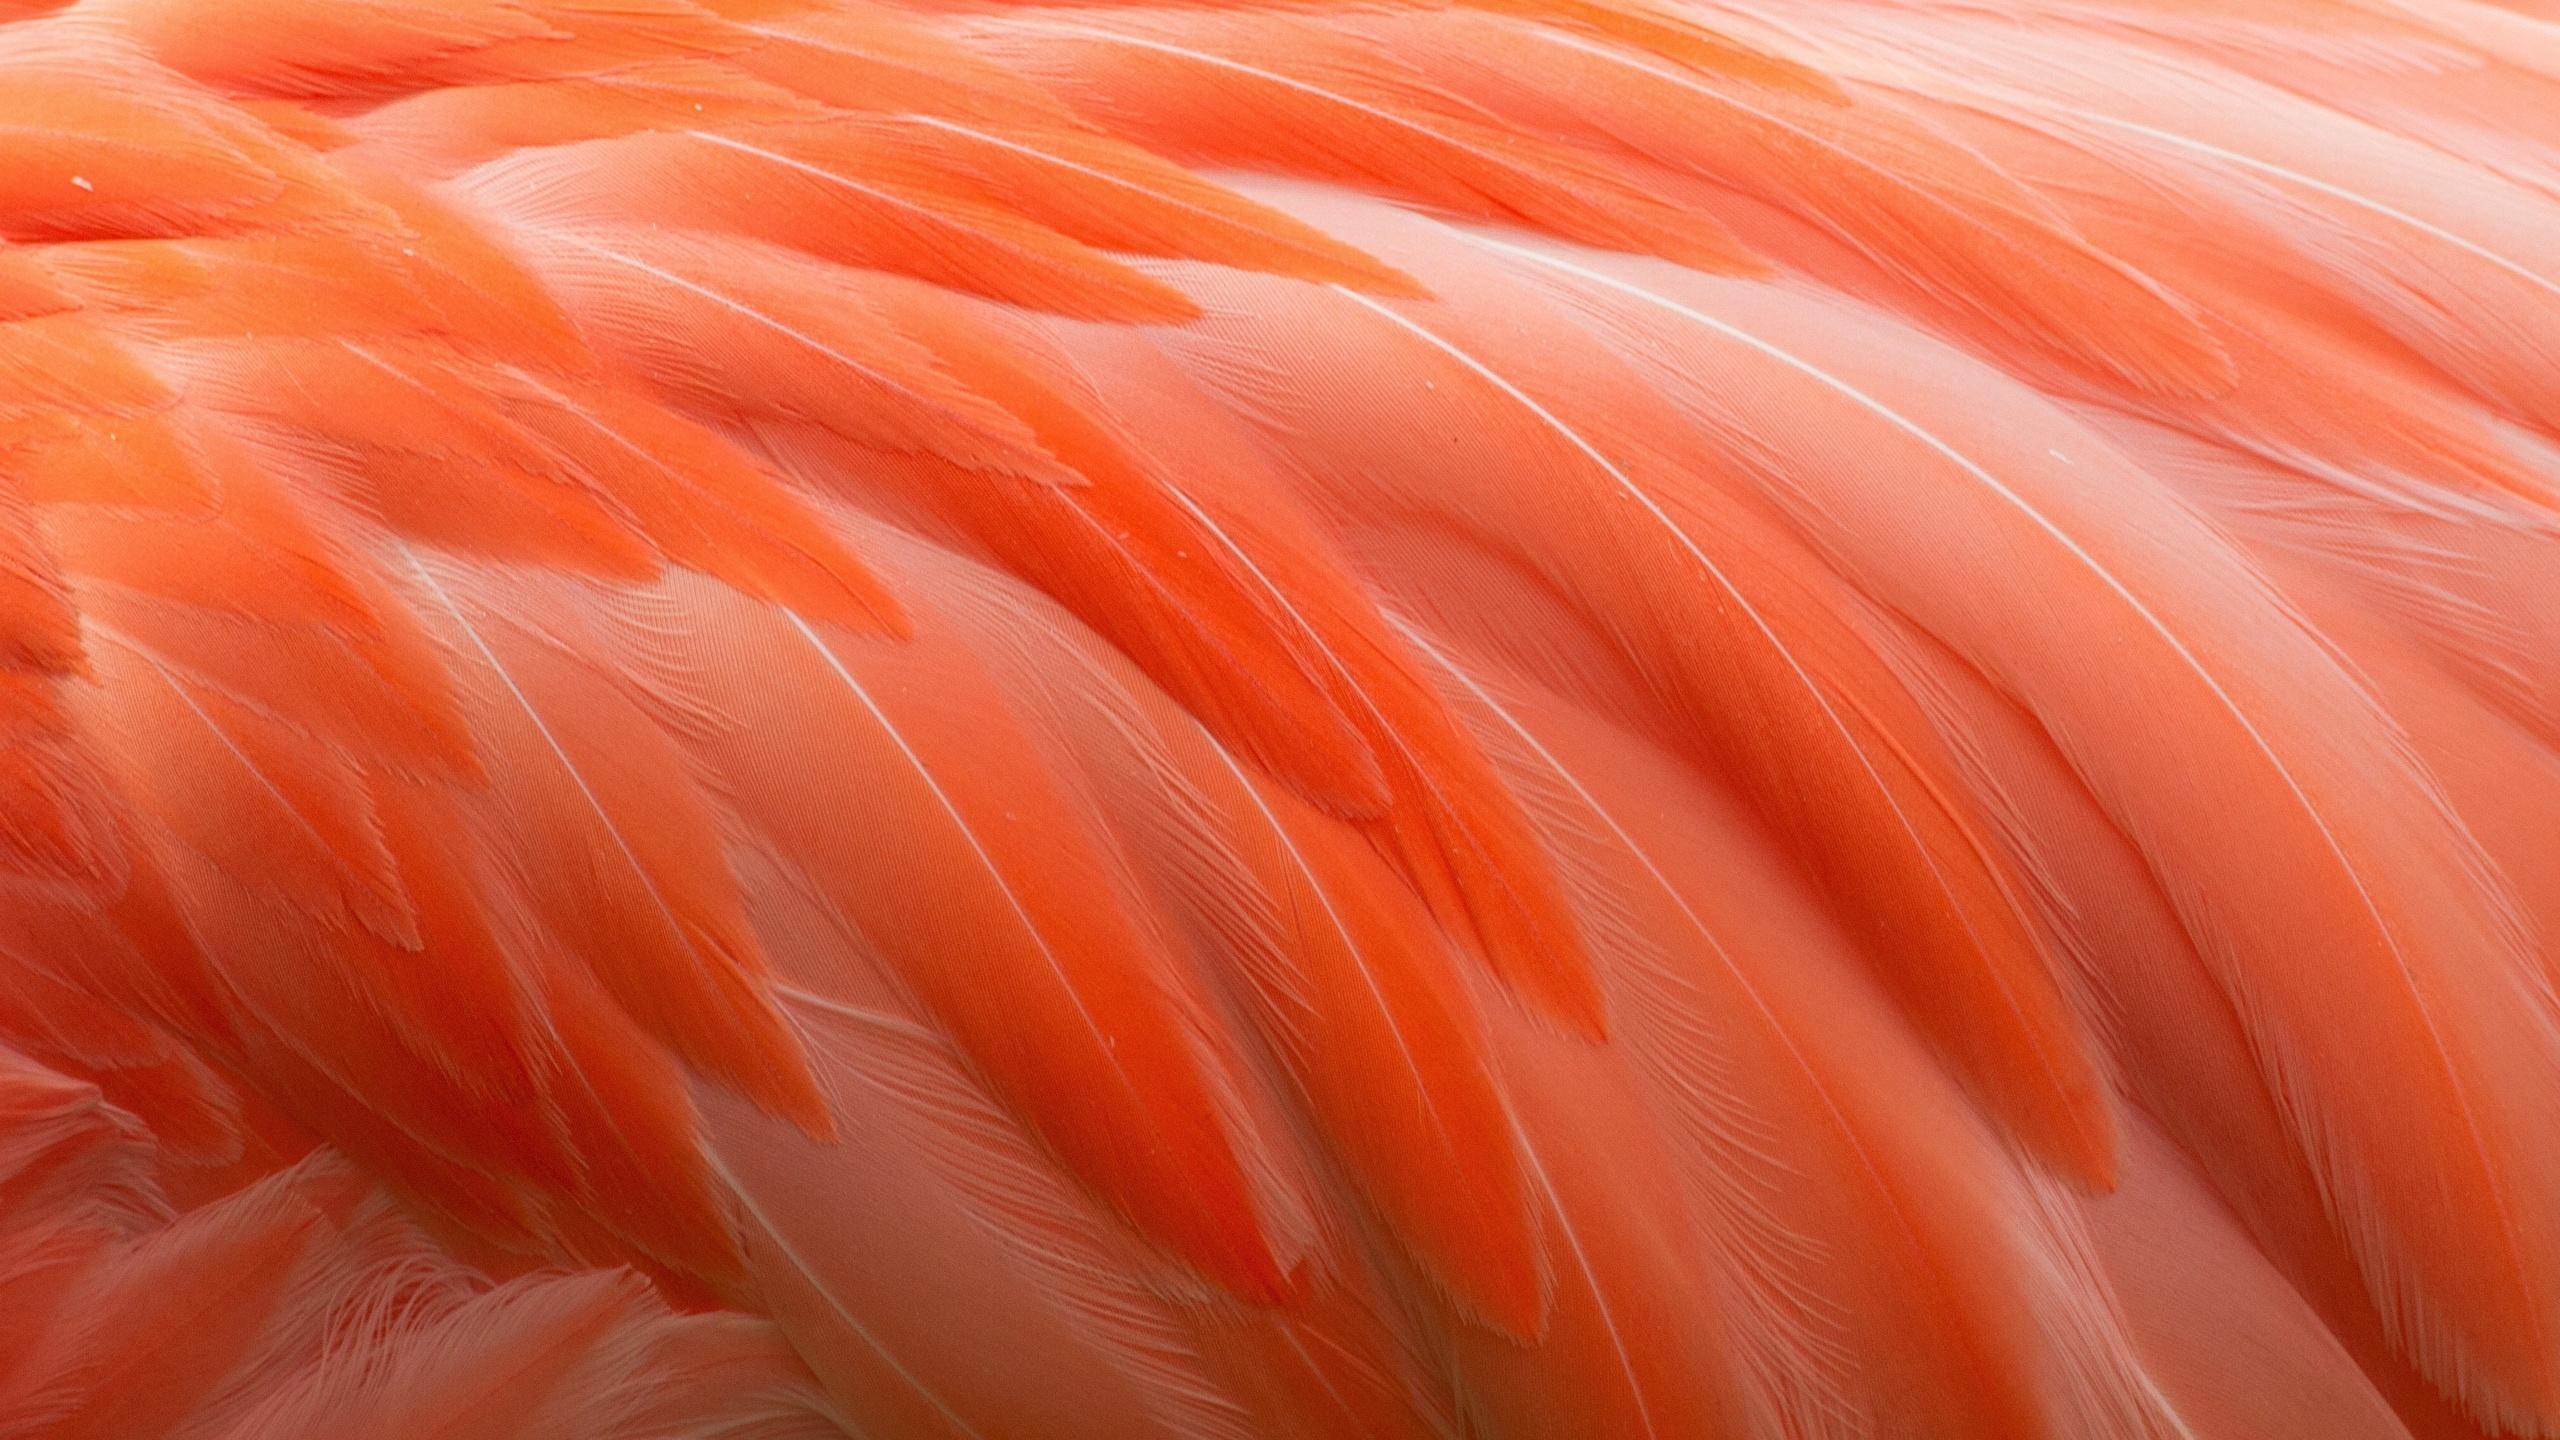 Wallpaper Flamingo Orange Macro Feathers 2560x1440 2560x1440